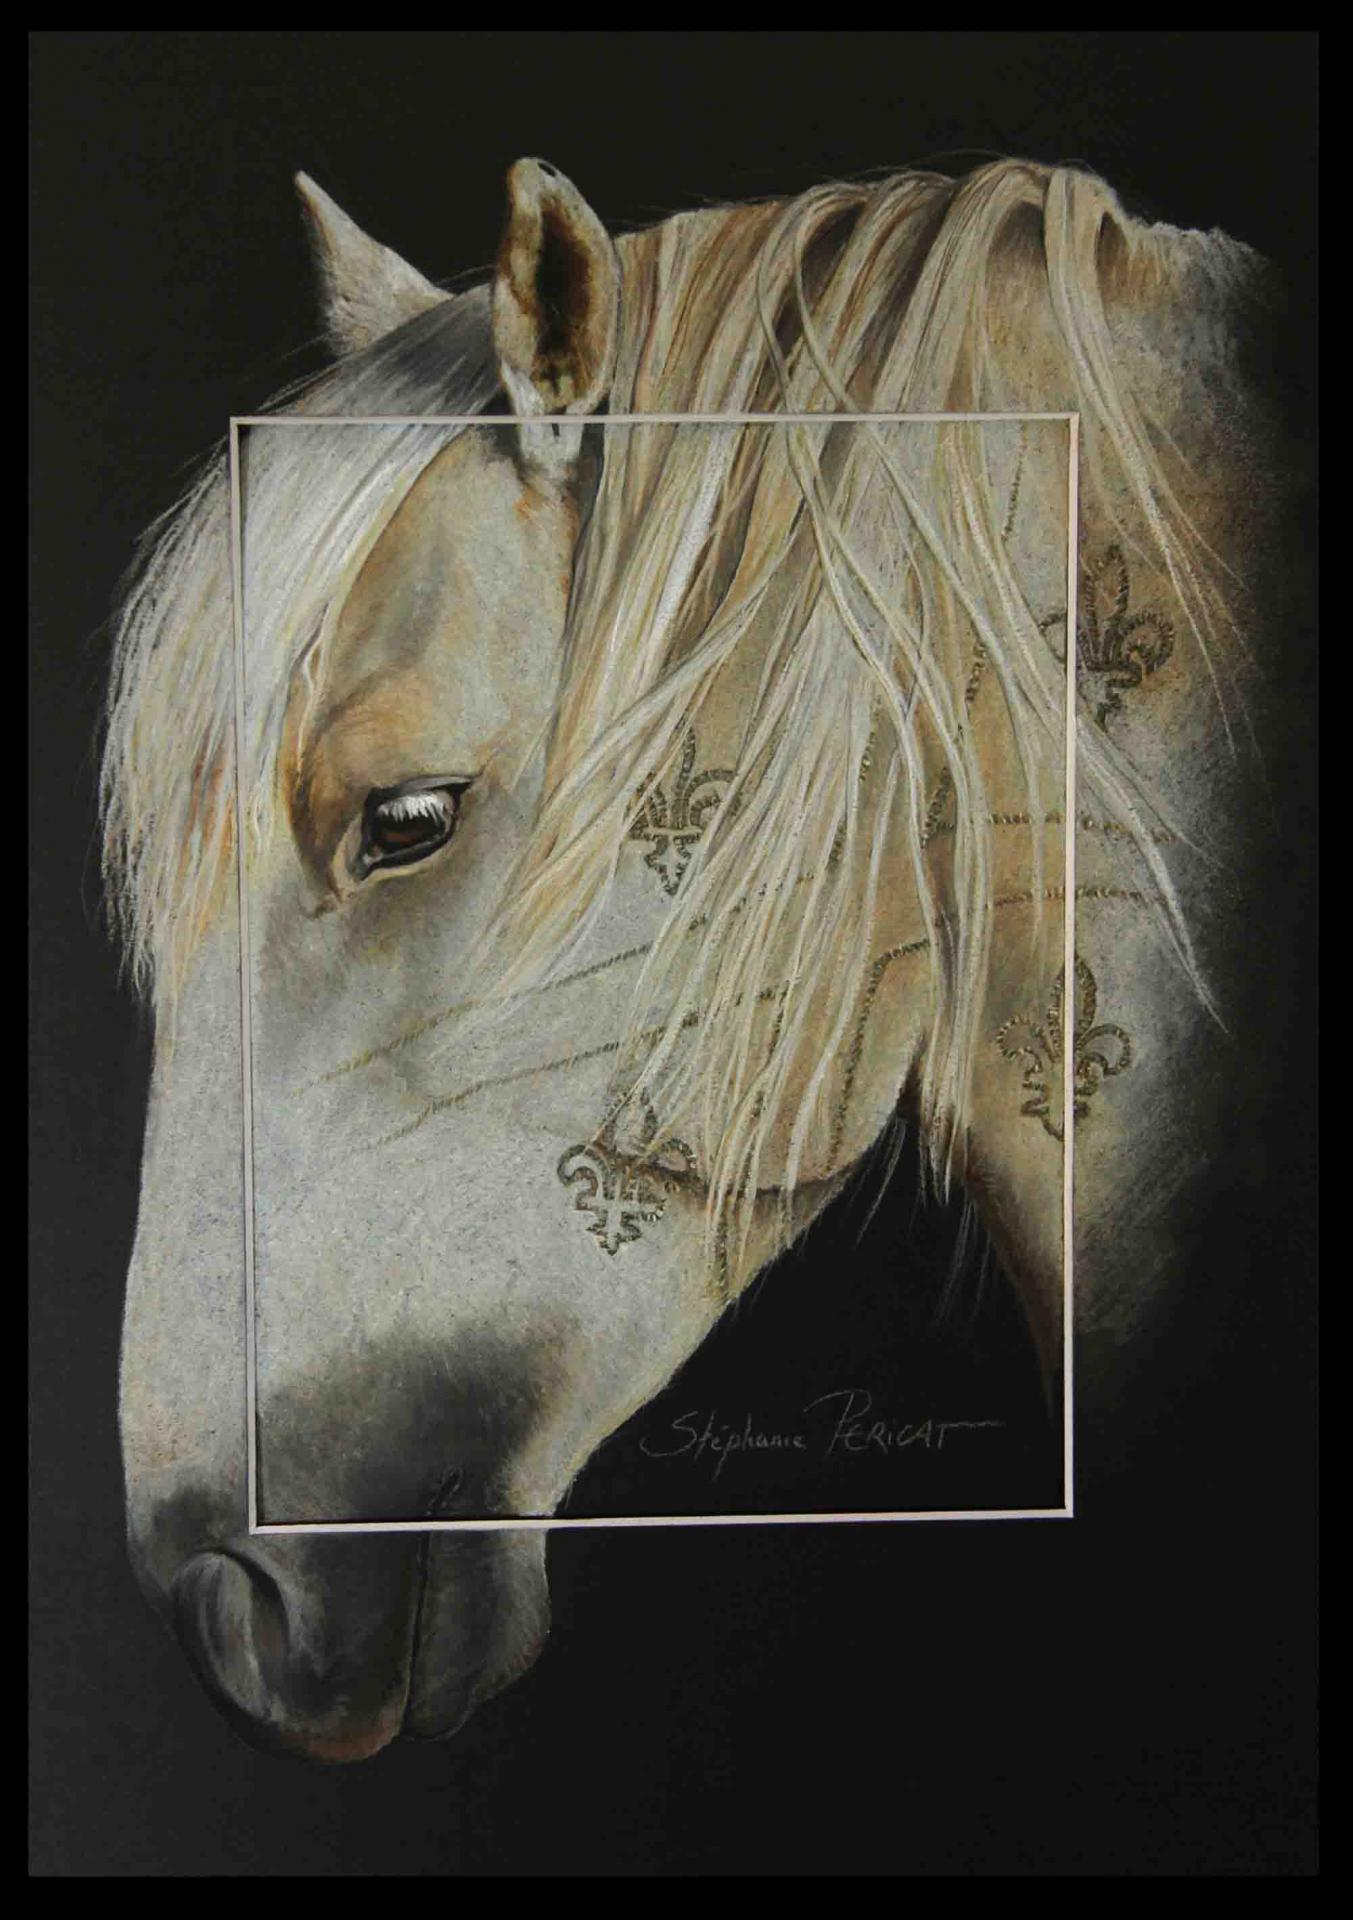 LOU PAIS NADJA ALIAS (Canadian stallion) -  30x40cm